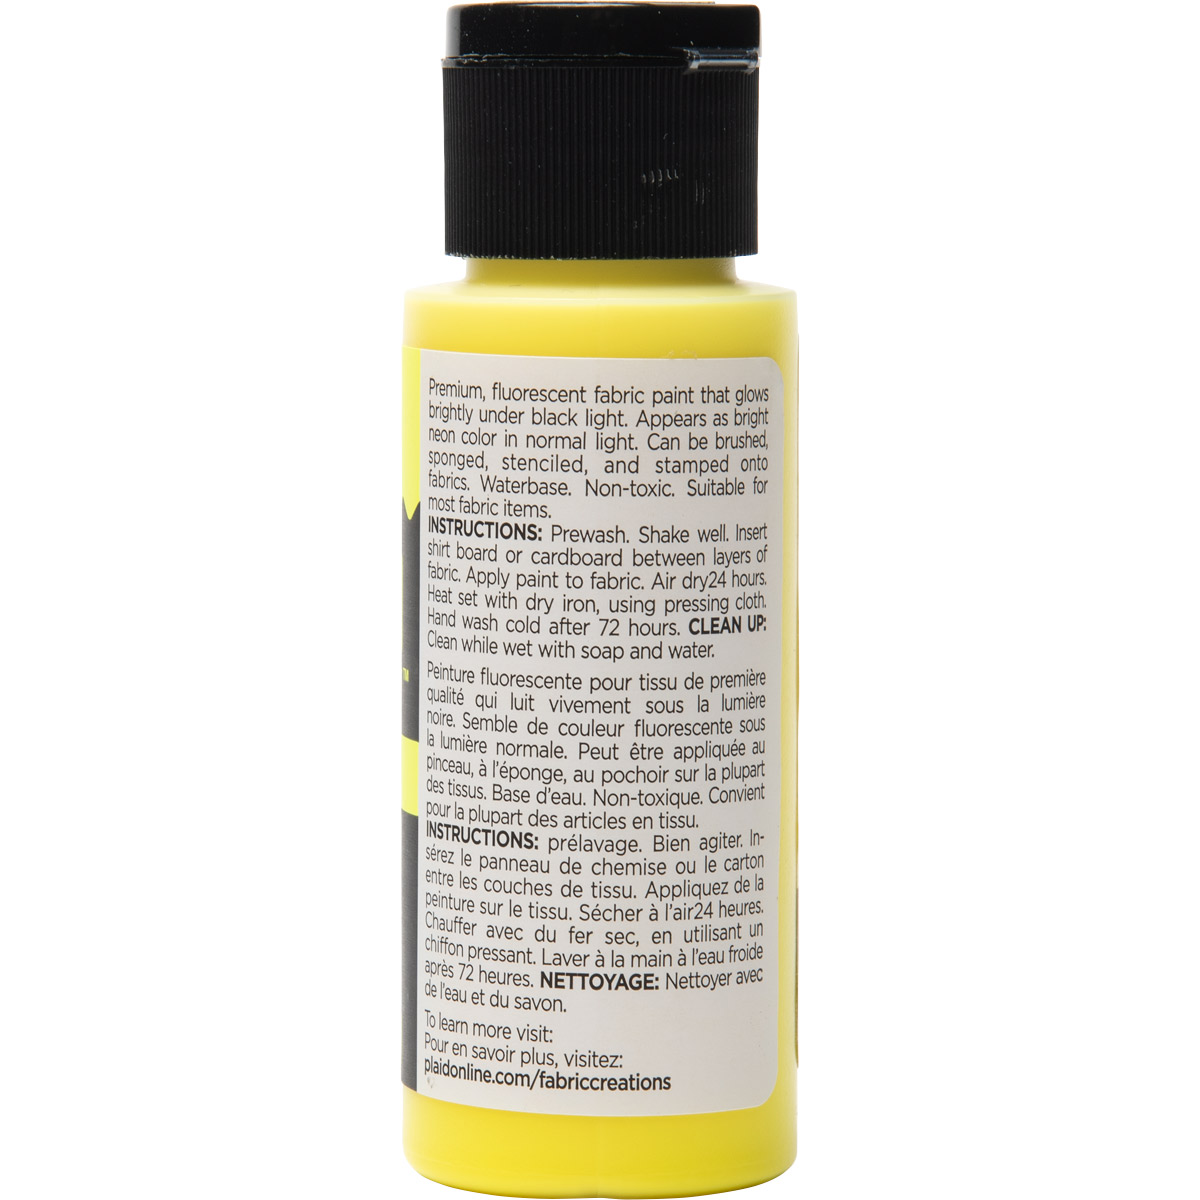 Fabric Creations™ Neon Black Light Fabric Paint - Yellow, 2 oz.